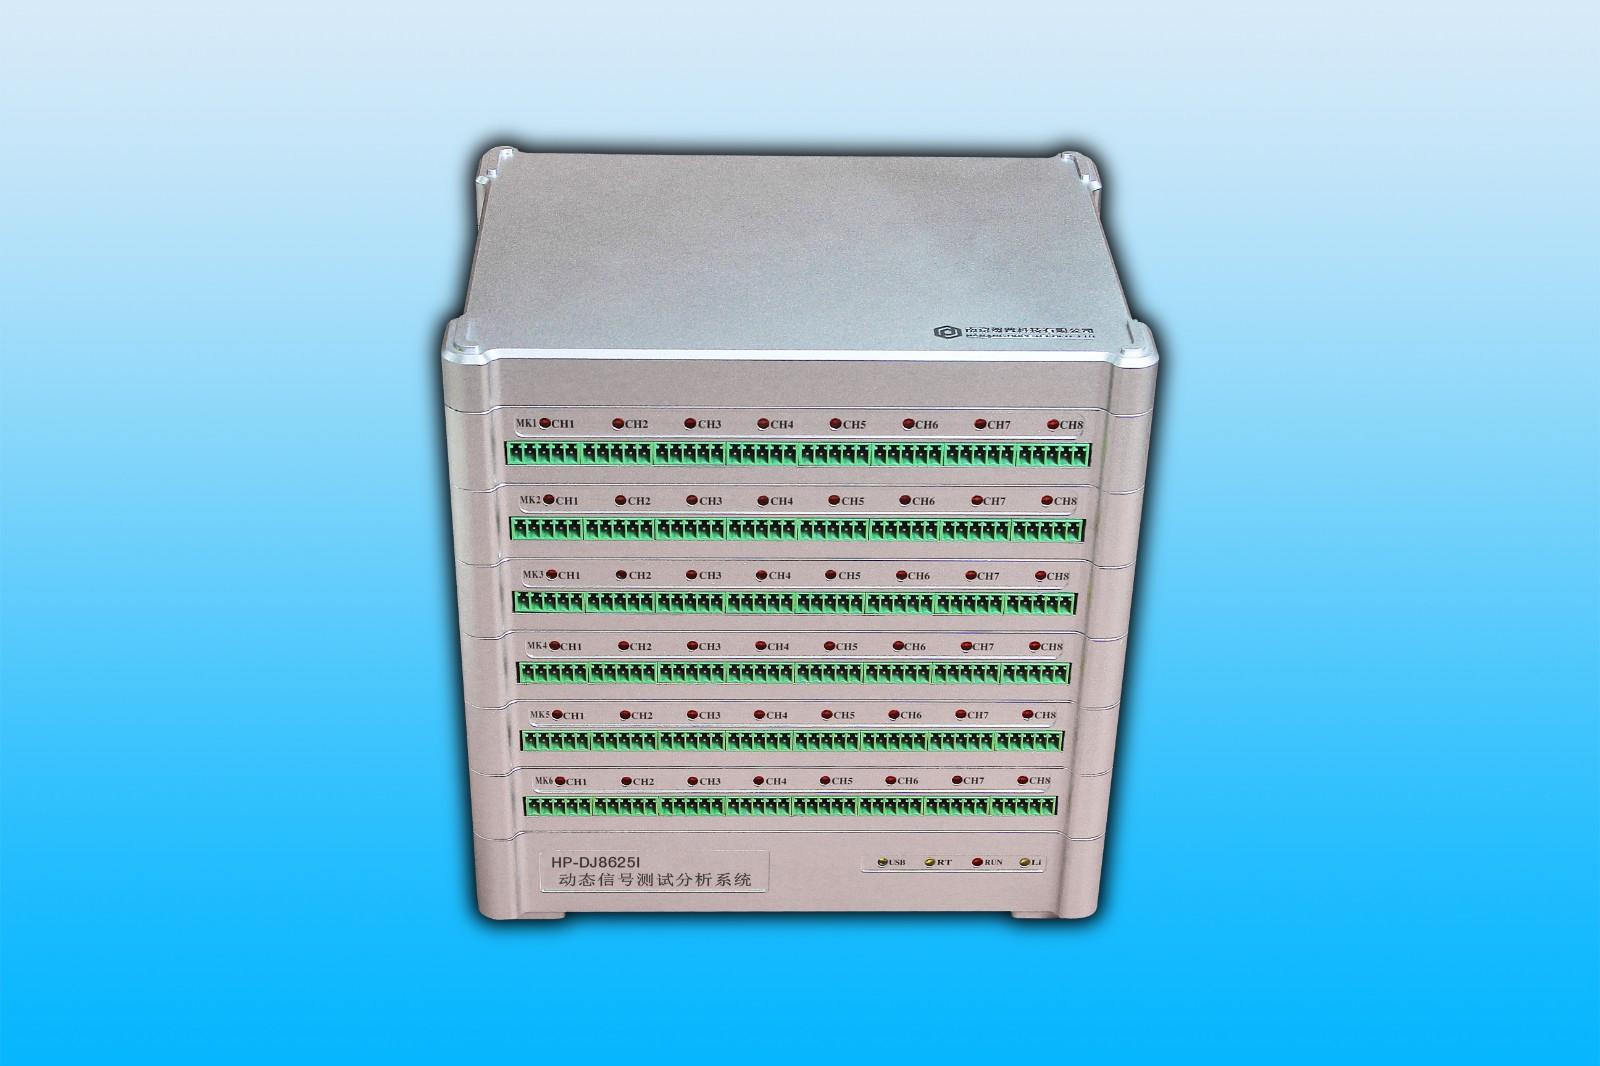 HP-DJ8625I 动态信号测试分析系统